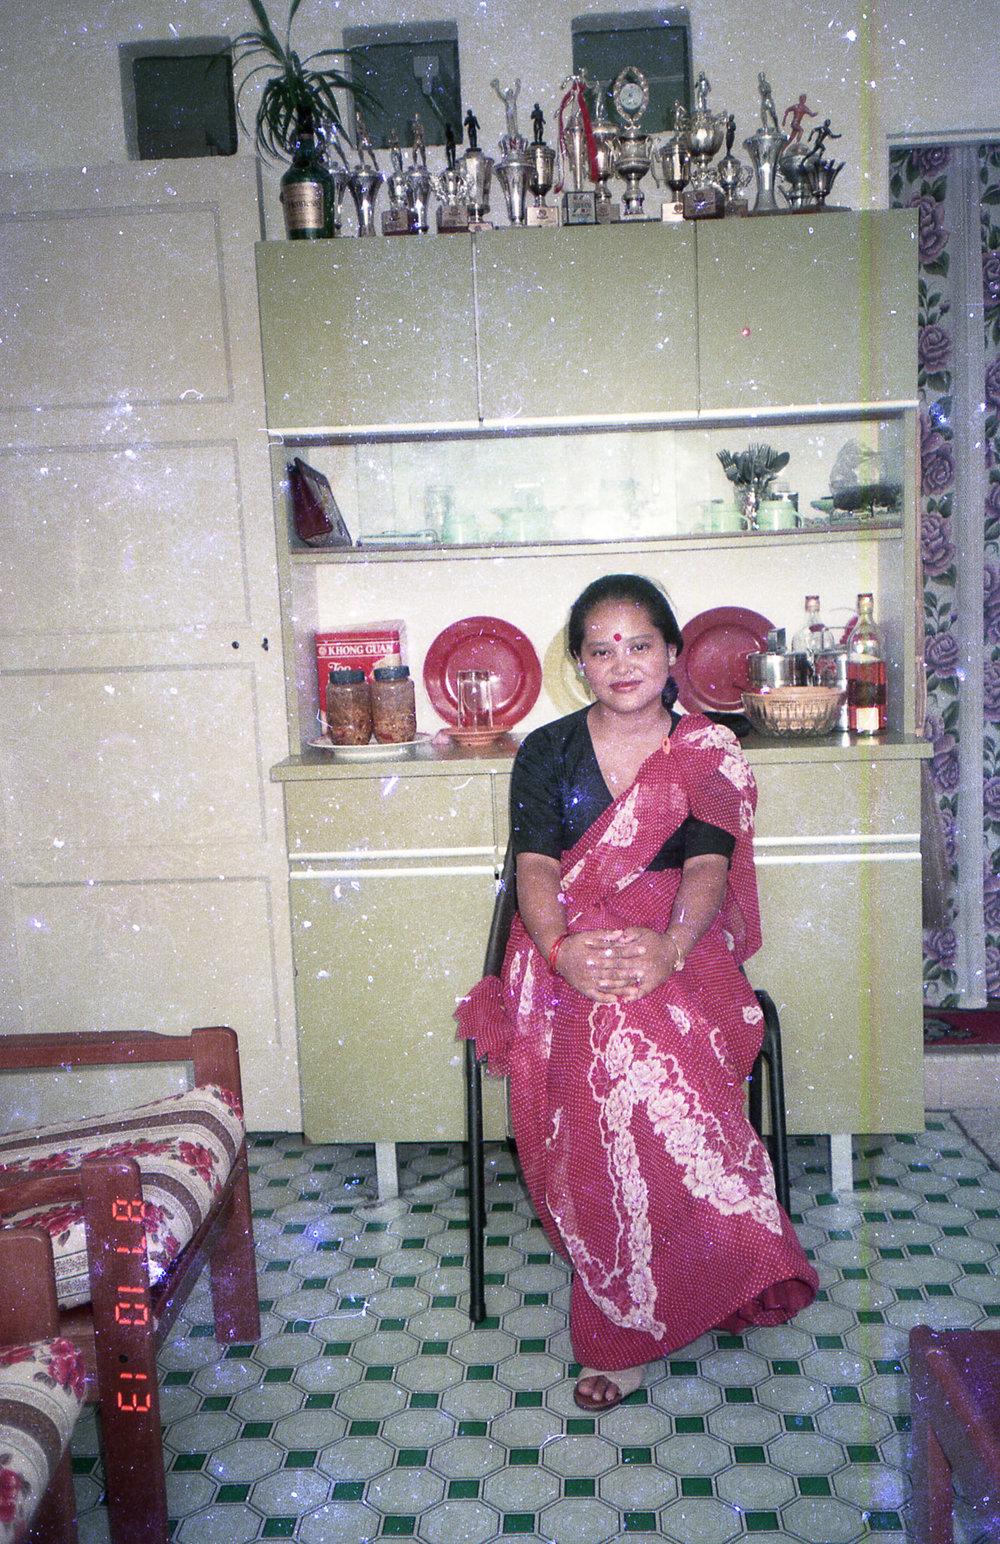 singapore-gurkhas-archive-photo-museum-zakaria-zainal-13.jpg